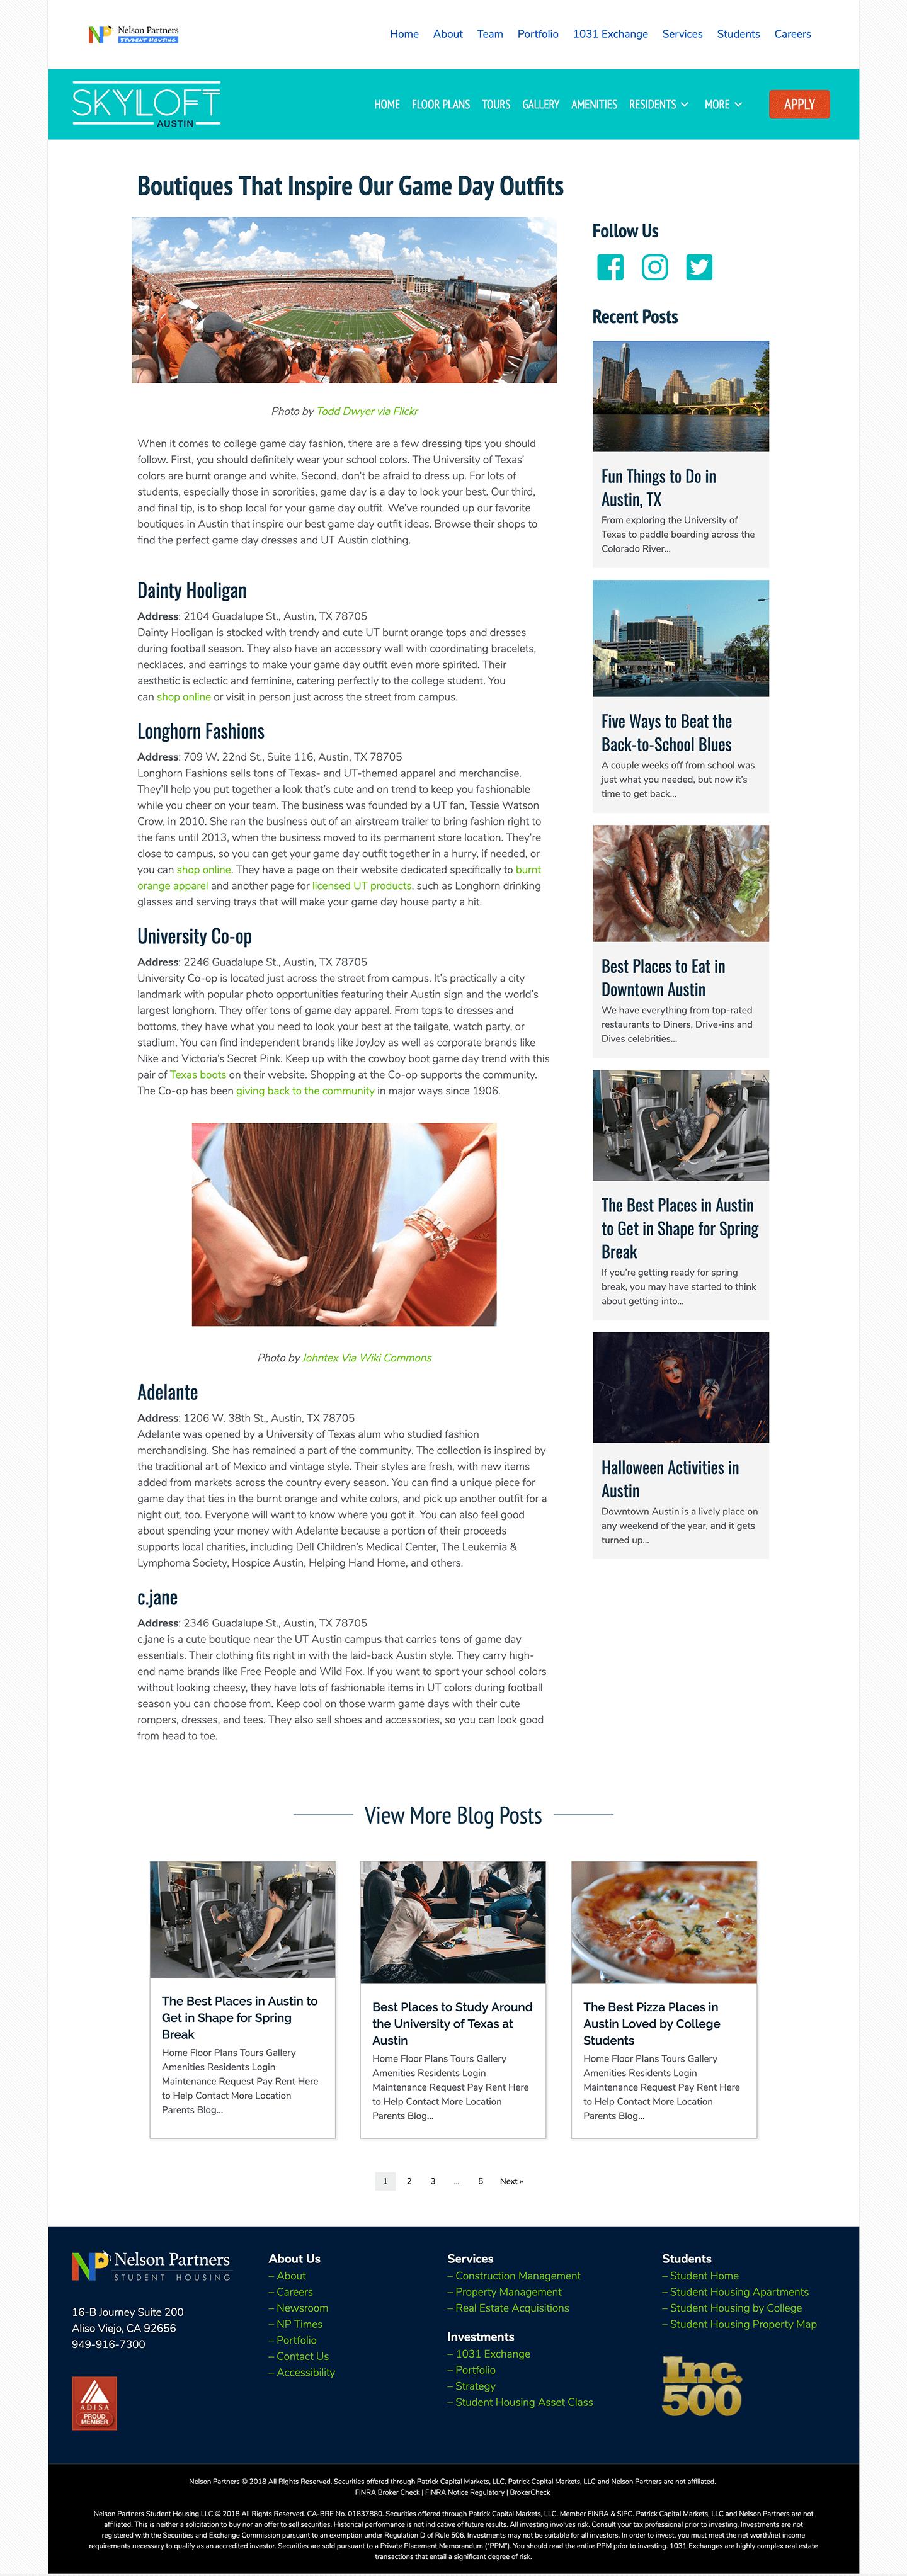 Skyloft-Student-Housing-Apartments-Website-Design-Article-Page